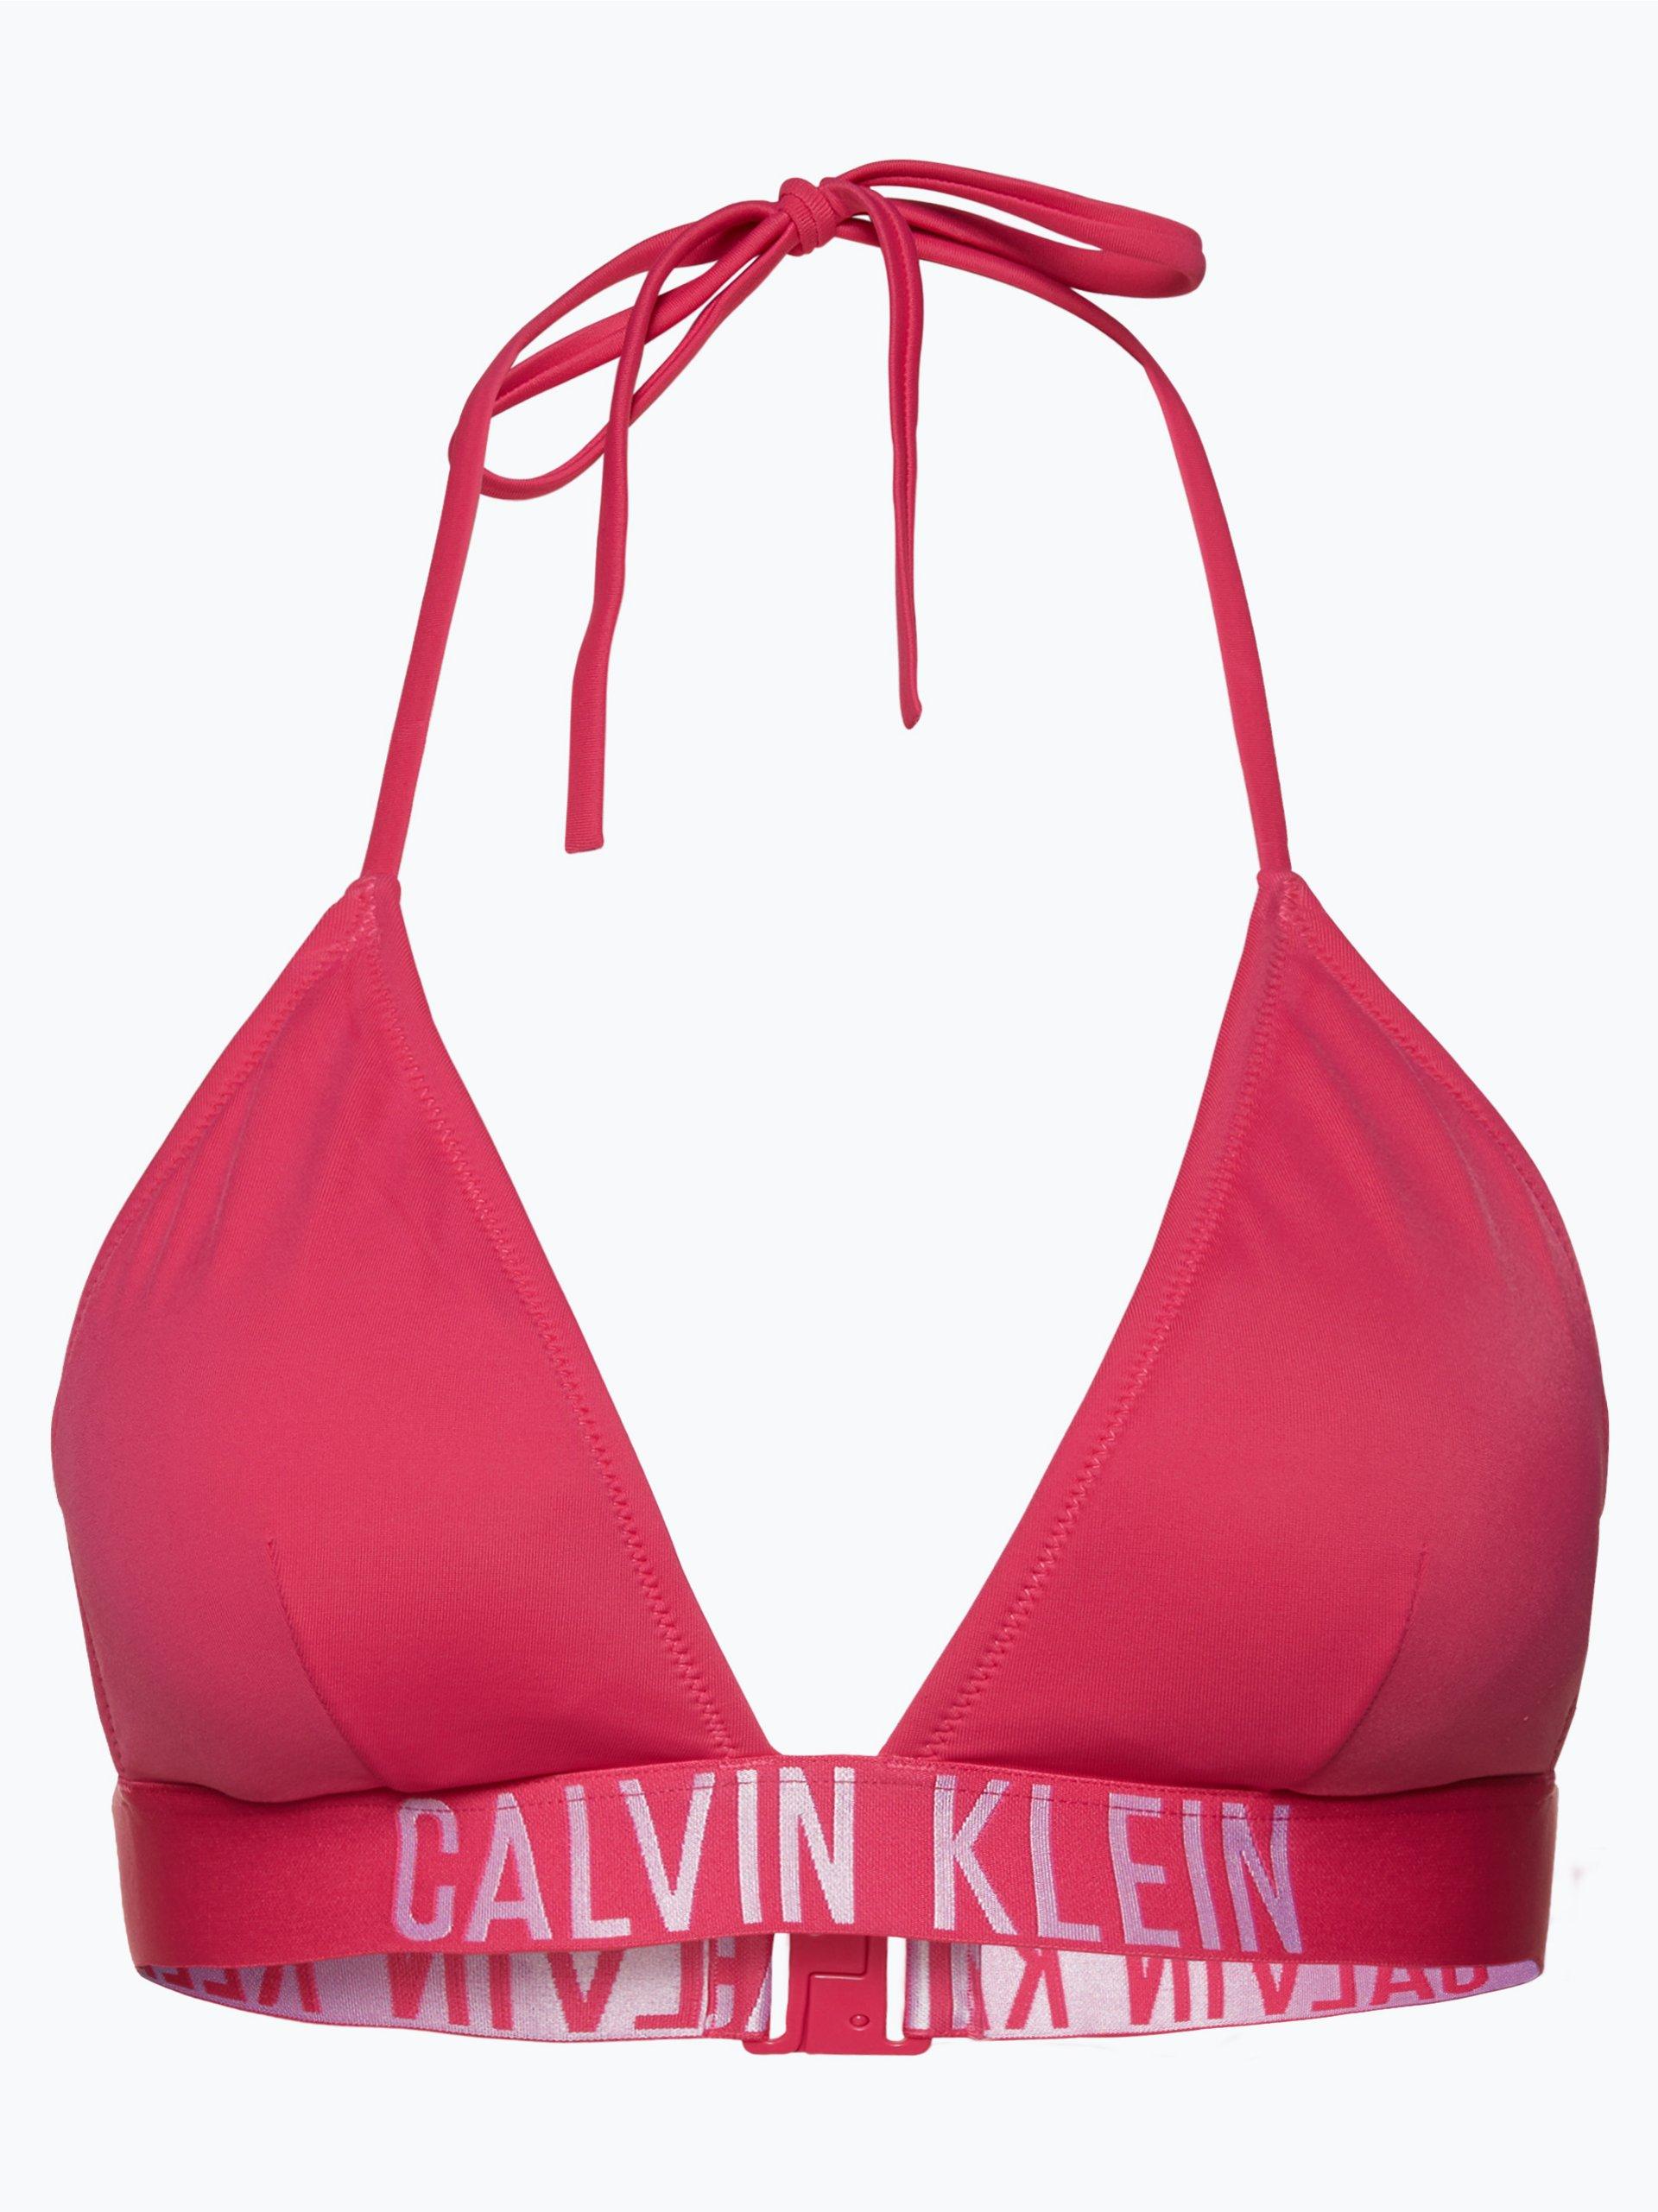 calvin klein damen bikini triangle rp fuchsia uni online. Black Bedroom Furniture Sets. Home Design Ideas